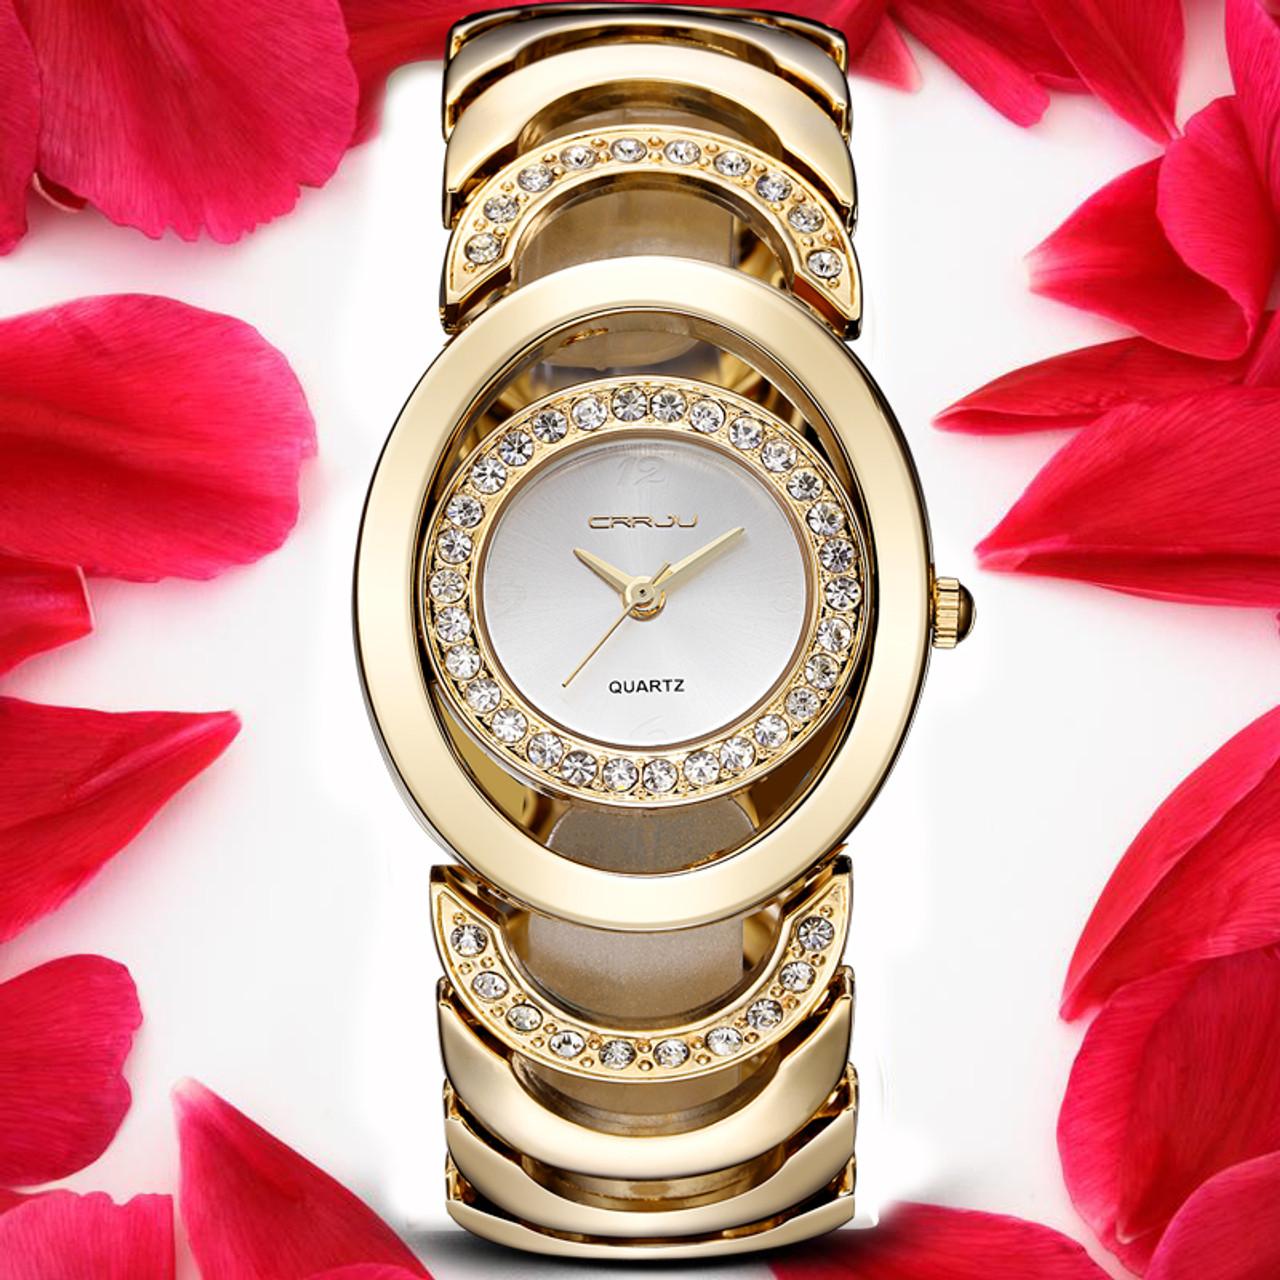 f65c48a3fb86c CRRJU Luxury Women Watch Famous Brands Gold Fashion Design Bracelet Watches  Ladies Women Wrist Watches Relogio ...